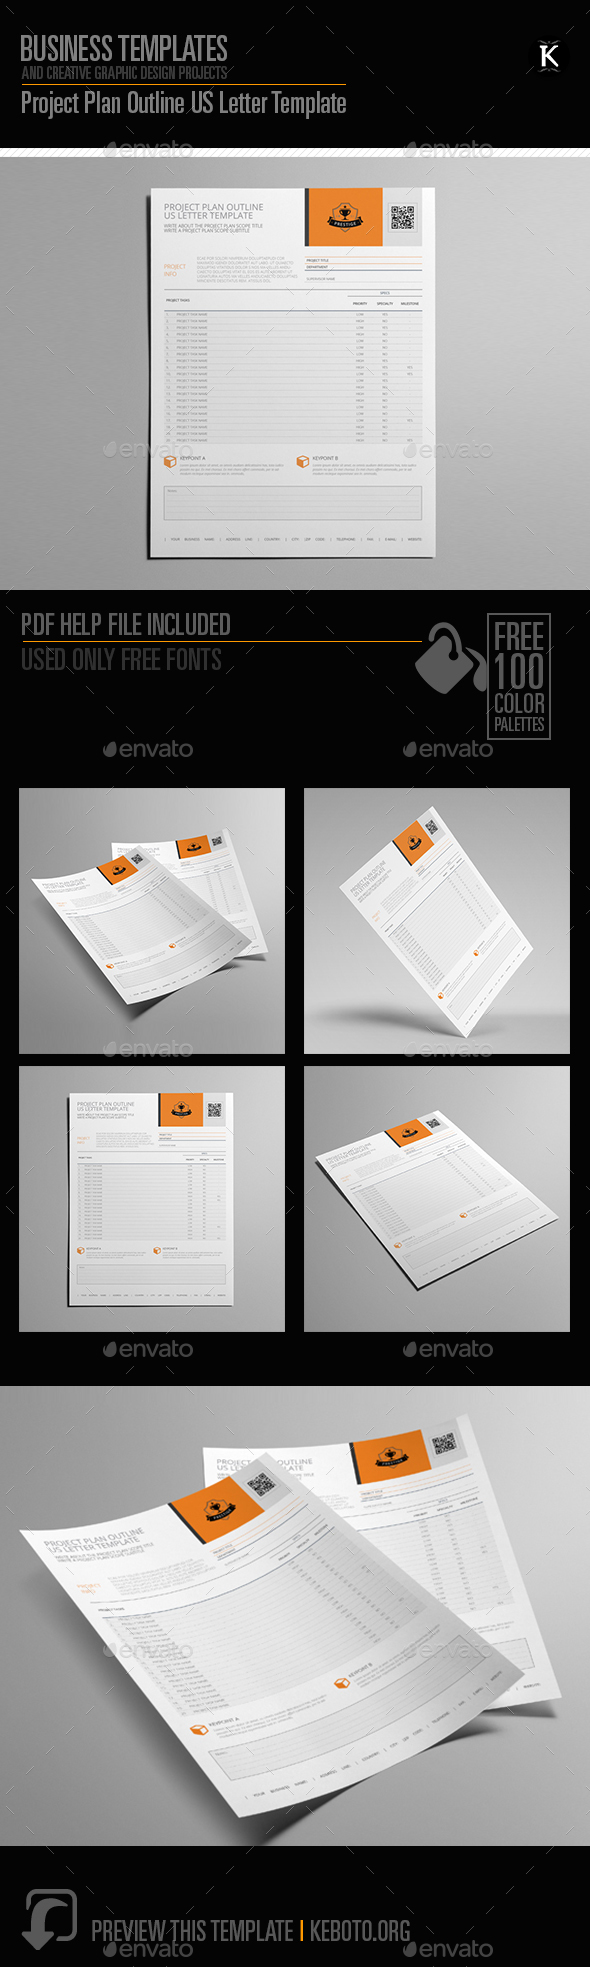 Project Plan Outline US Letter Template - Miscellaneous Print Templates